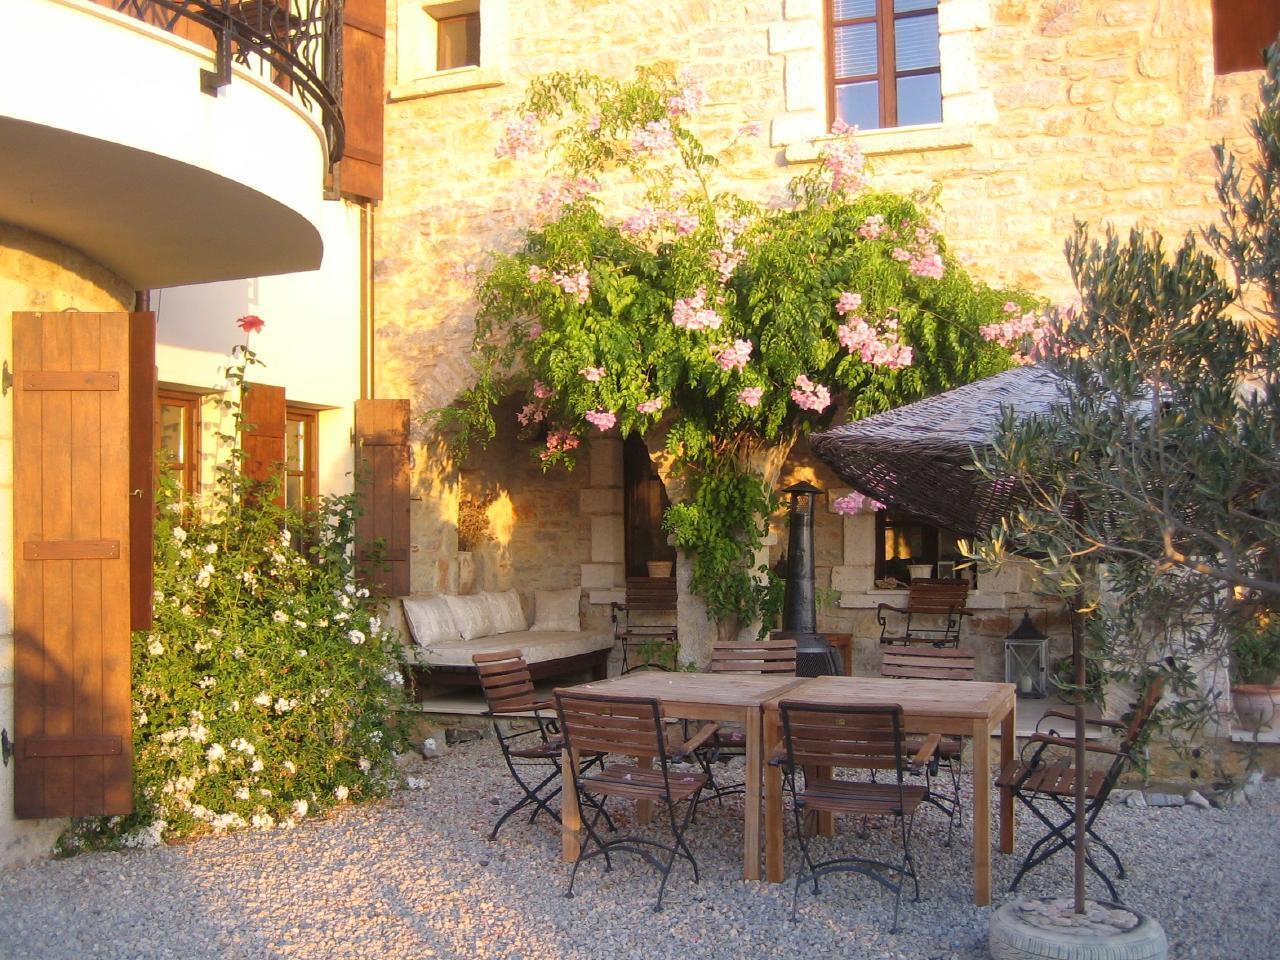 Maison de vacances Exklusives Chalet, romantisch am Berghang und Meer gelegen (2506674), Mesudiye, , Région Egéenne, Turquie, image 29